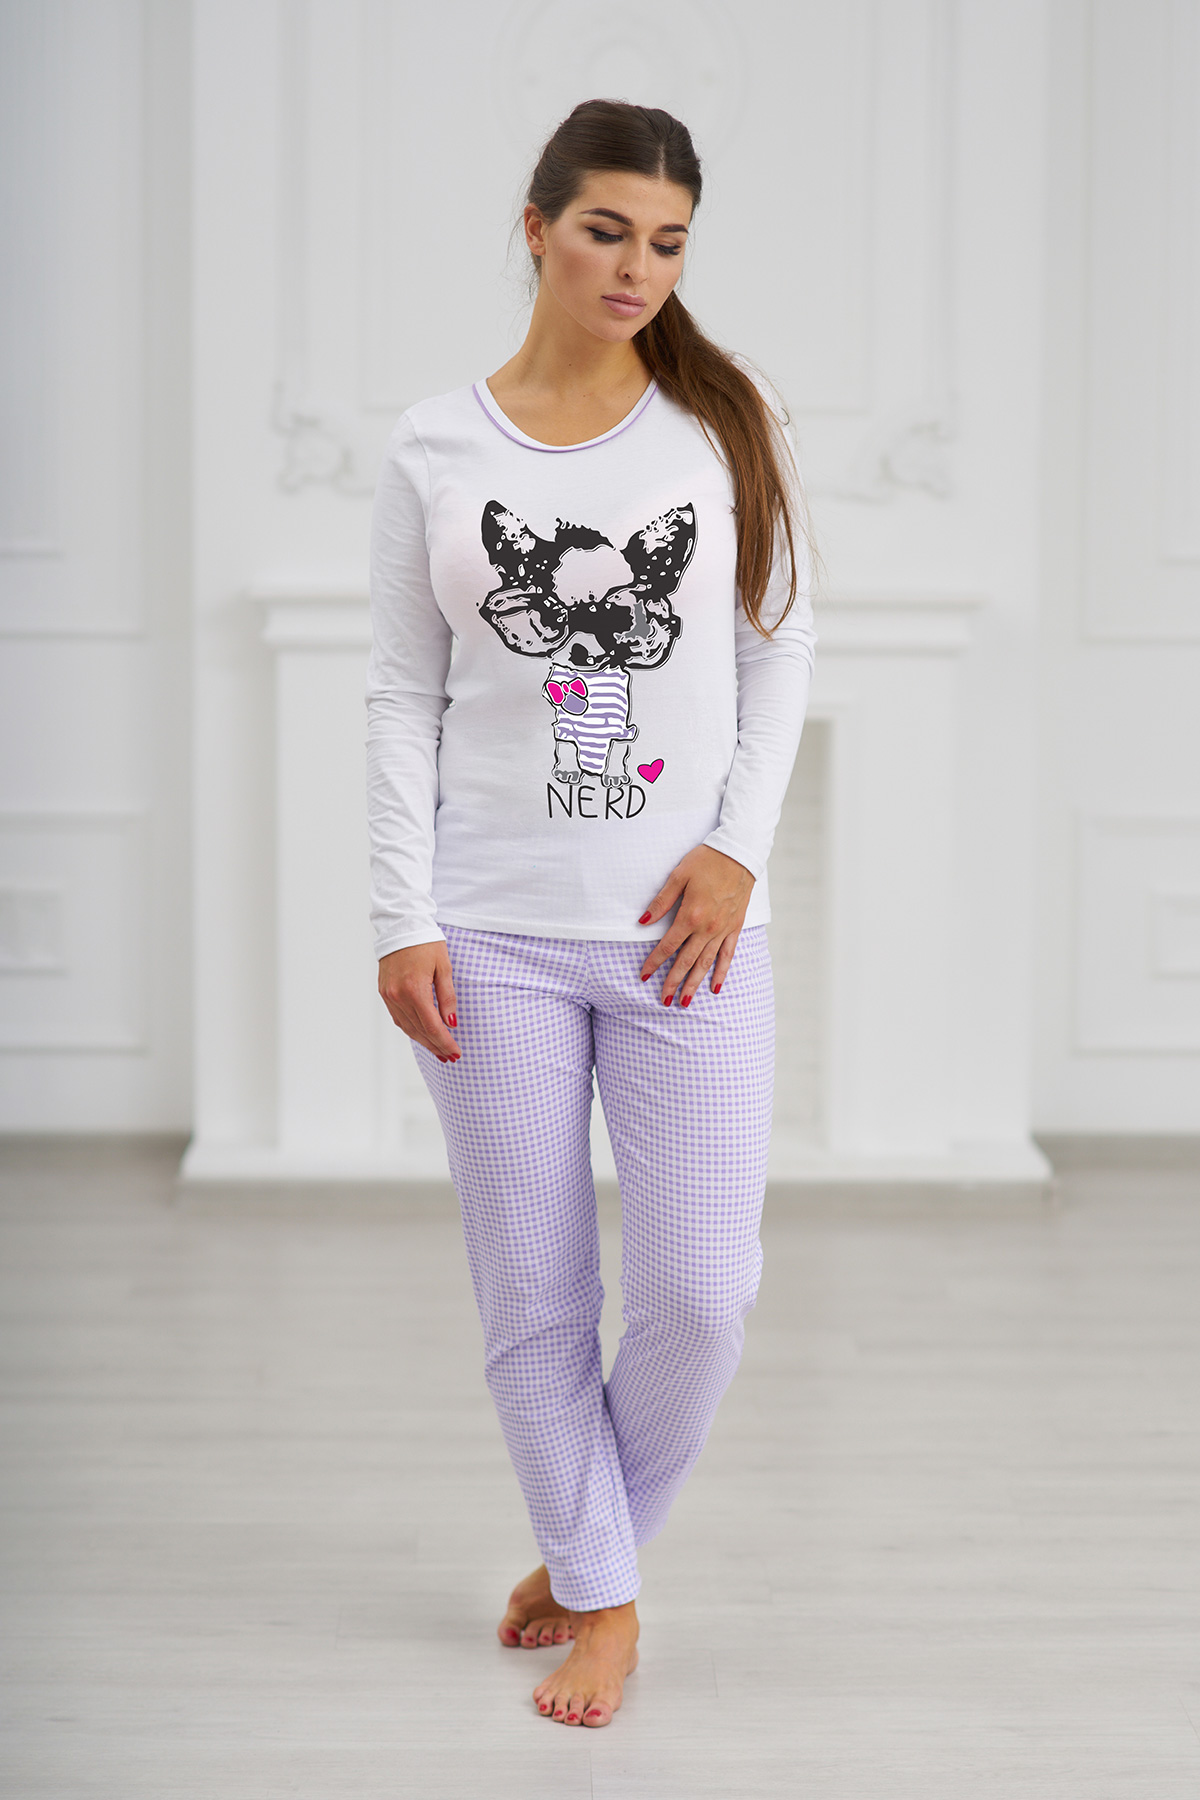 Жен. пижама С брюками Фиолетовый р. 44Пижамы<br>Факт. ОГ: Кофты - 80 см <br>Факт. ОТ: Кофты - 80 см, брюк - 62 см <br>Факт. ОБ: Кофты - 82 см, брюк - 86 см <br>Длина рукава: 63 см <br>Длина по спинке: 65 см <br>Высота посадки: 25 см <br>Длина брючин по внут. шву: 78 см<br><br>Тип: Жен. пижама<br>Размер: 44<br>Материал: Трикотаж